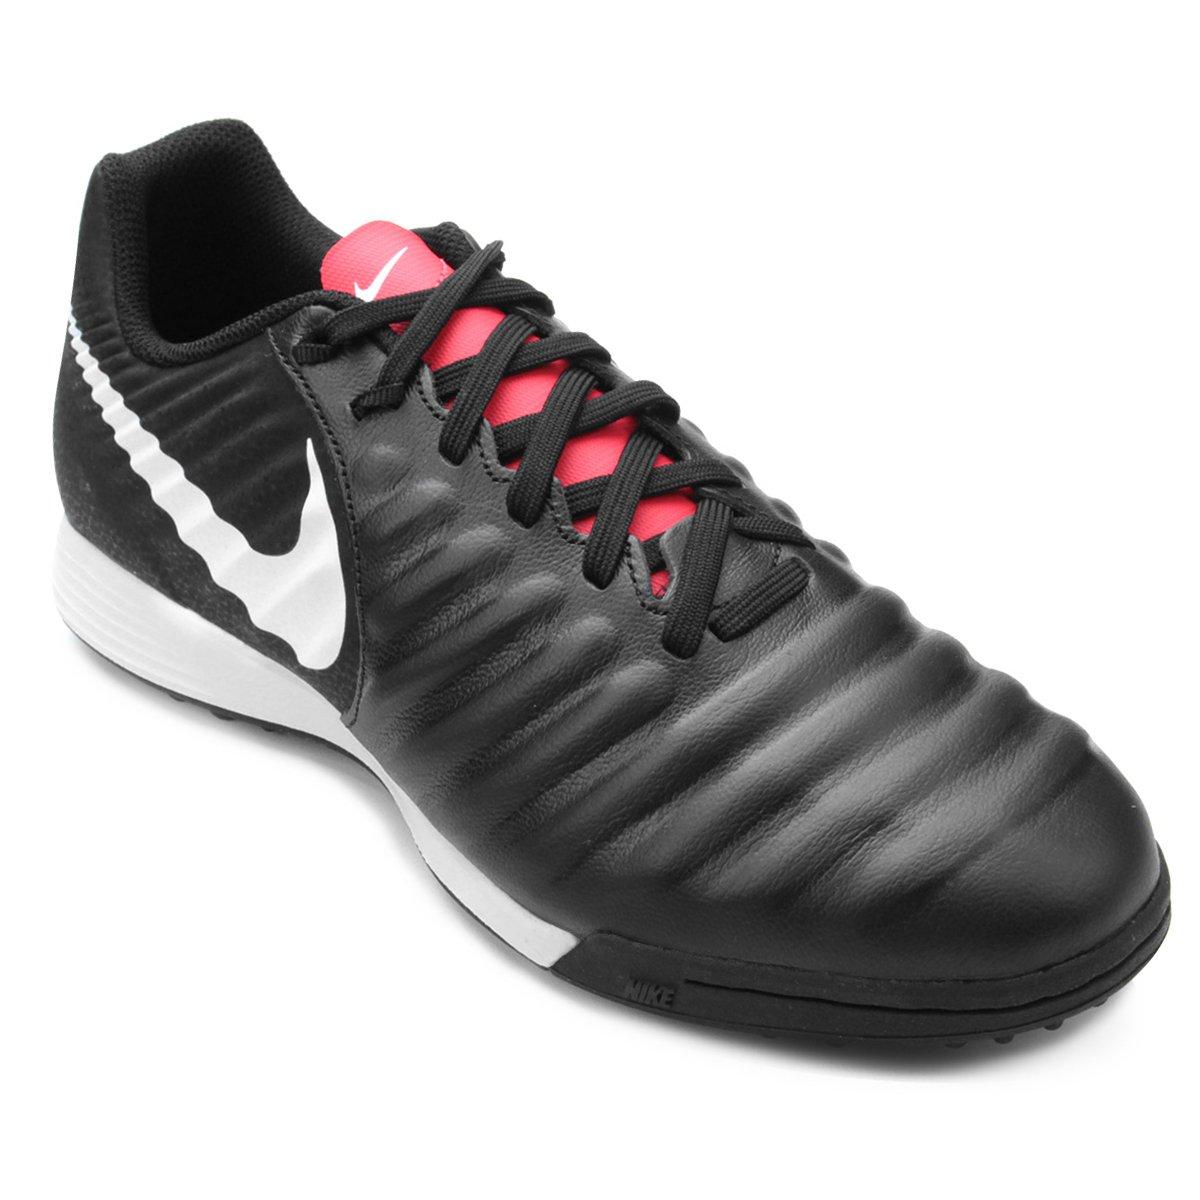 Chuteira Society Nike TF Tiempo Legend 7 Academy TF Nike Masculina Compre 78e94e